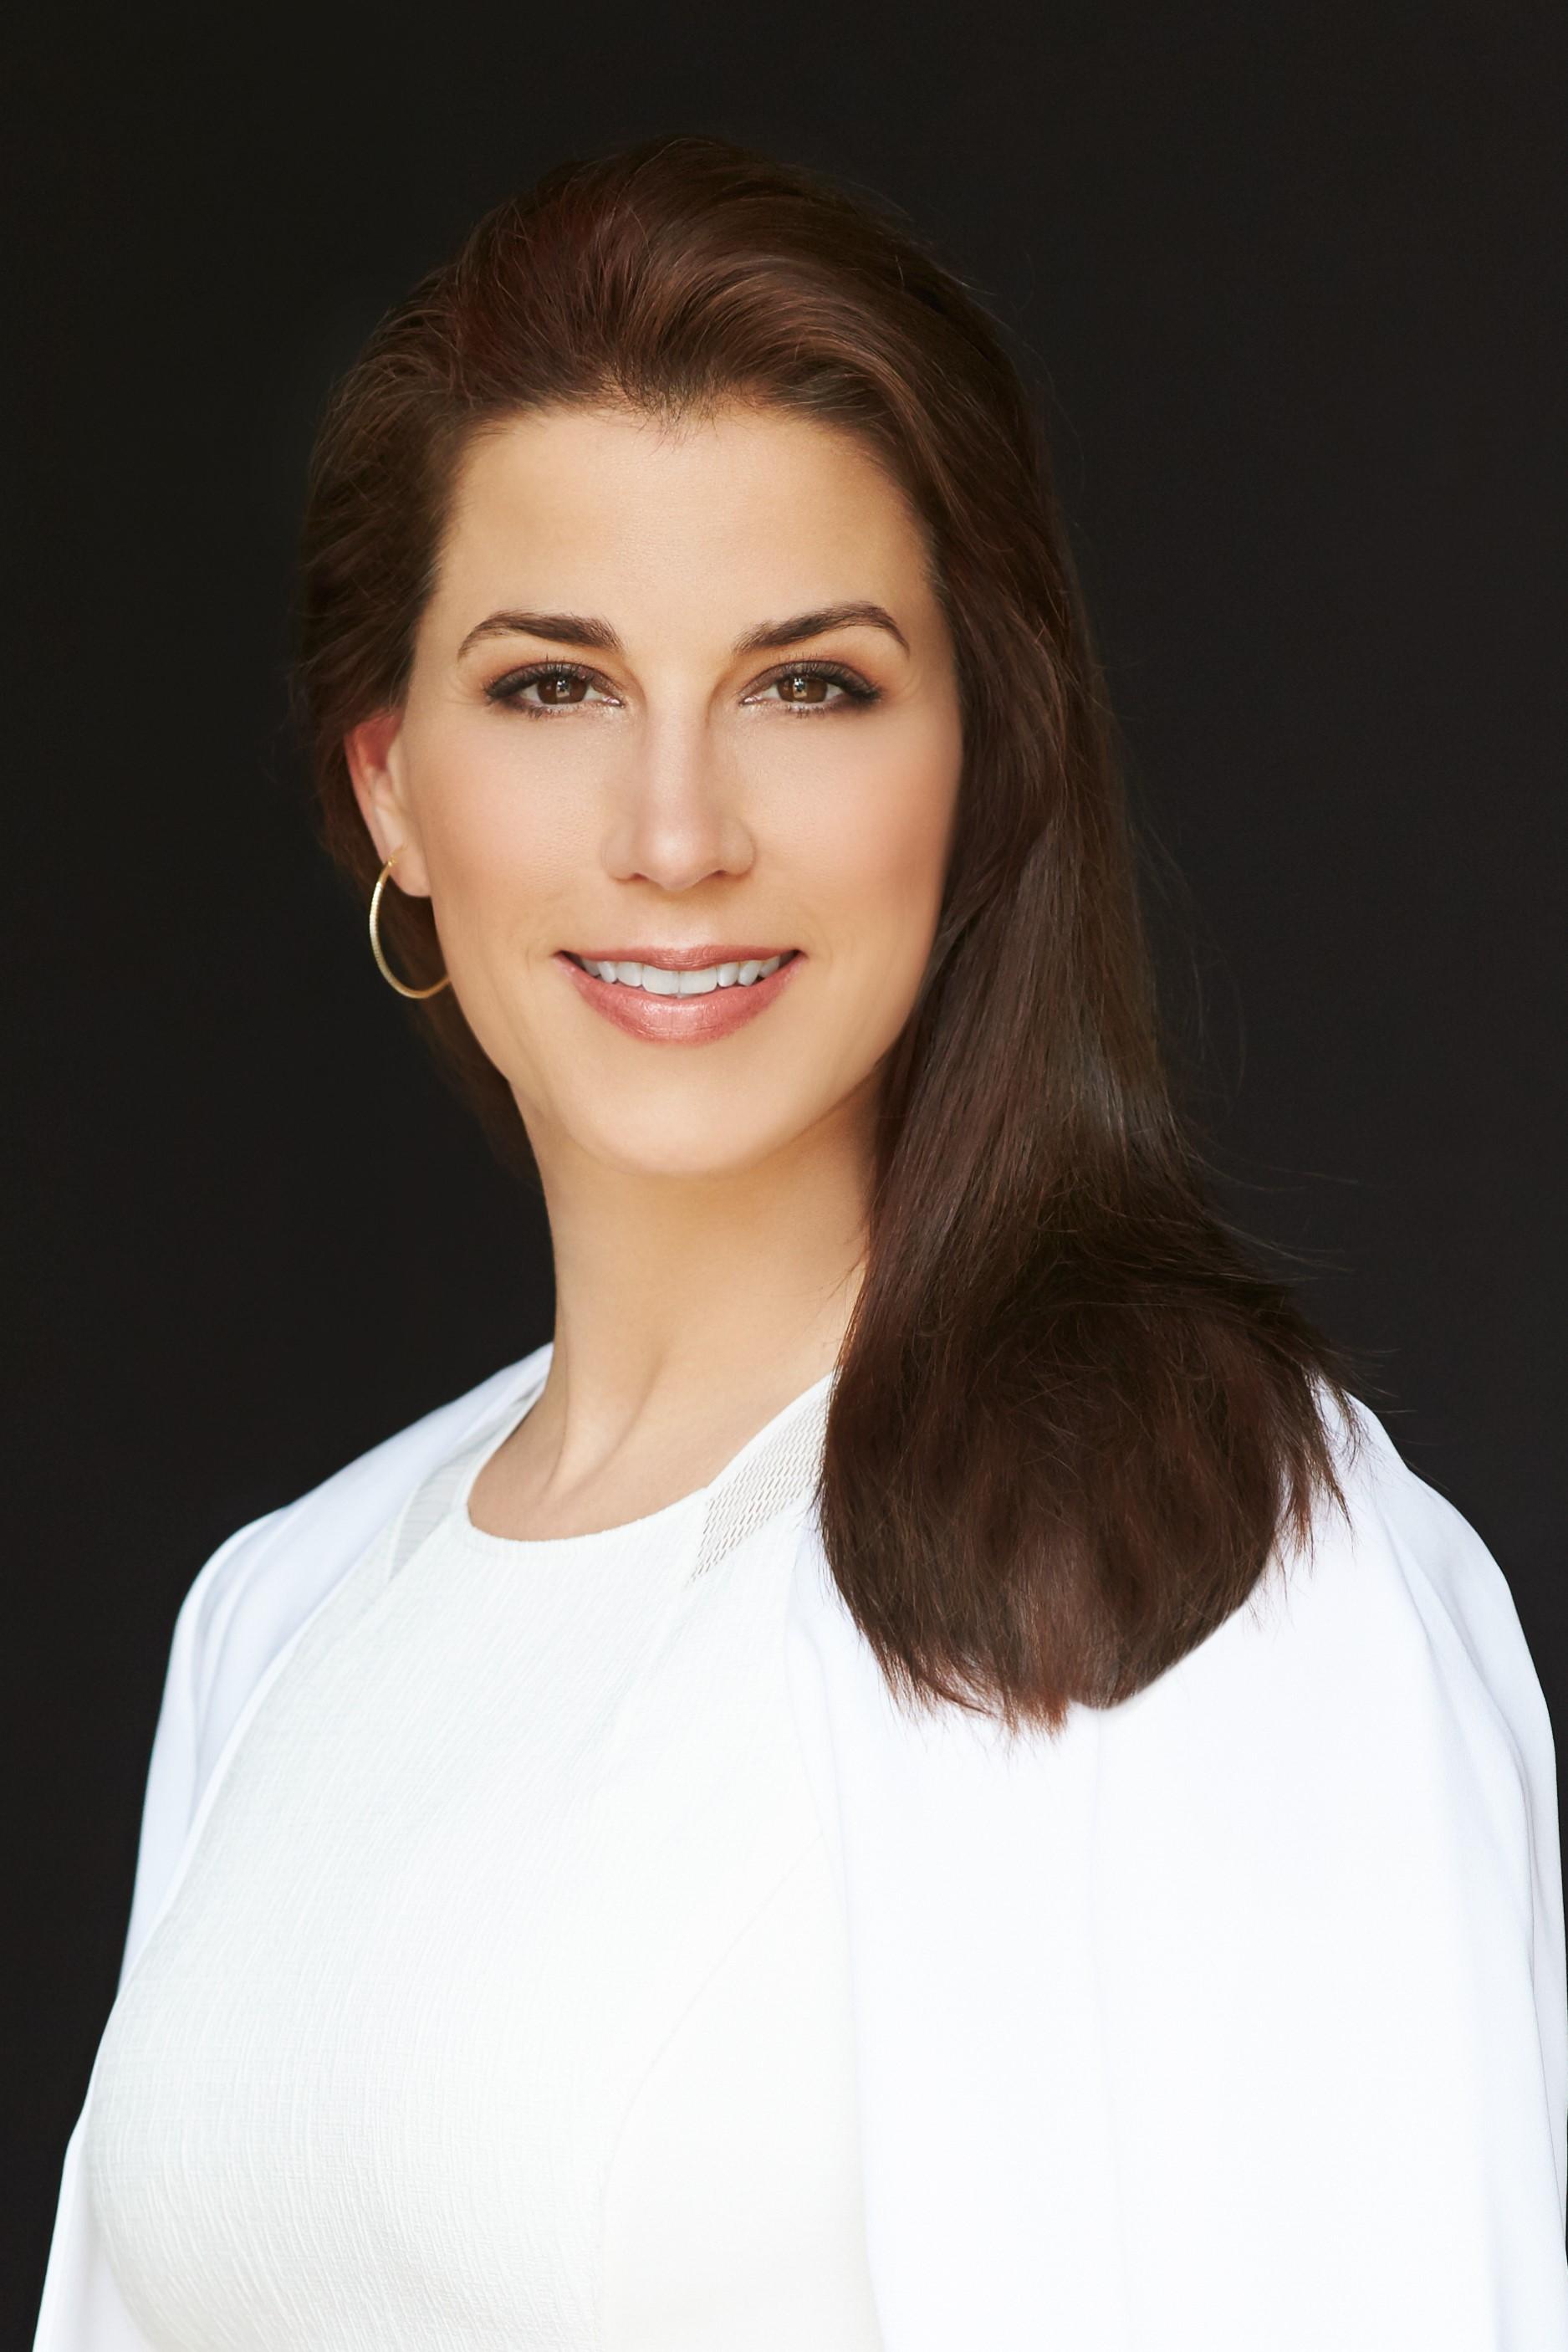 Dale Noelle:  True Model Management